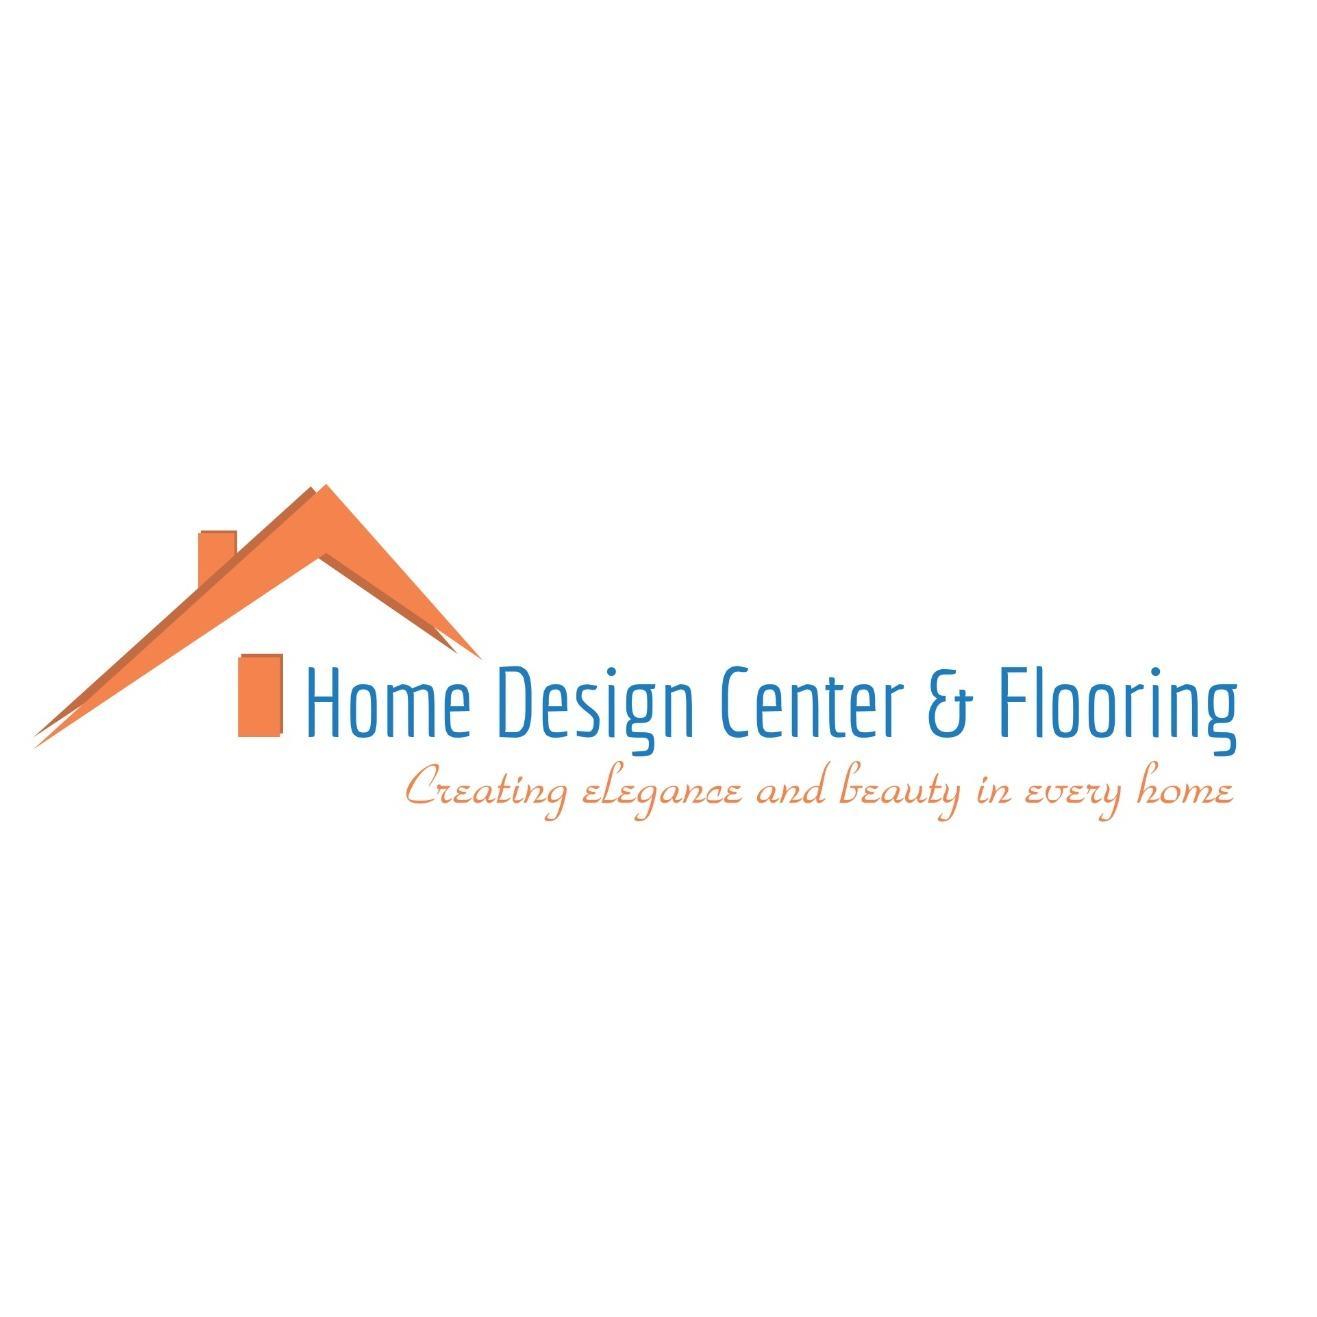 Home Design Center & Flooring image 7